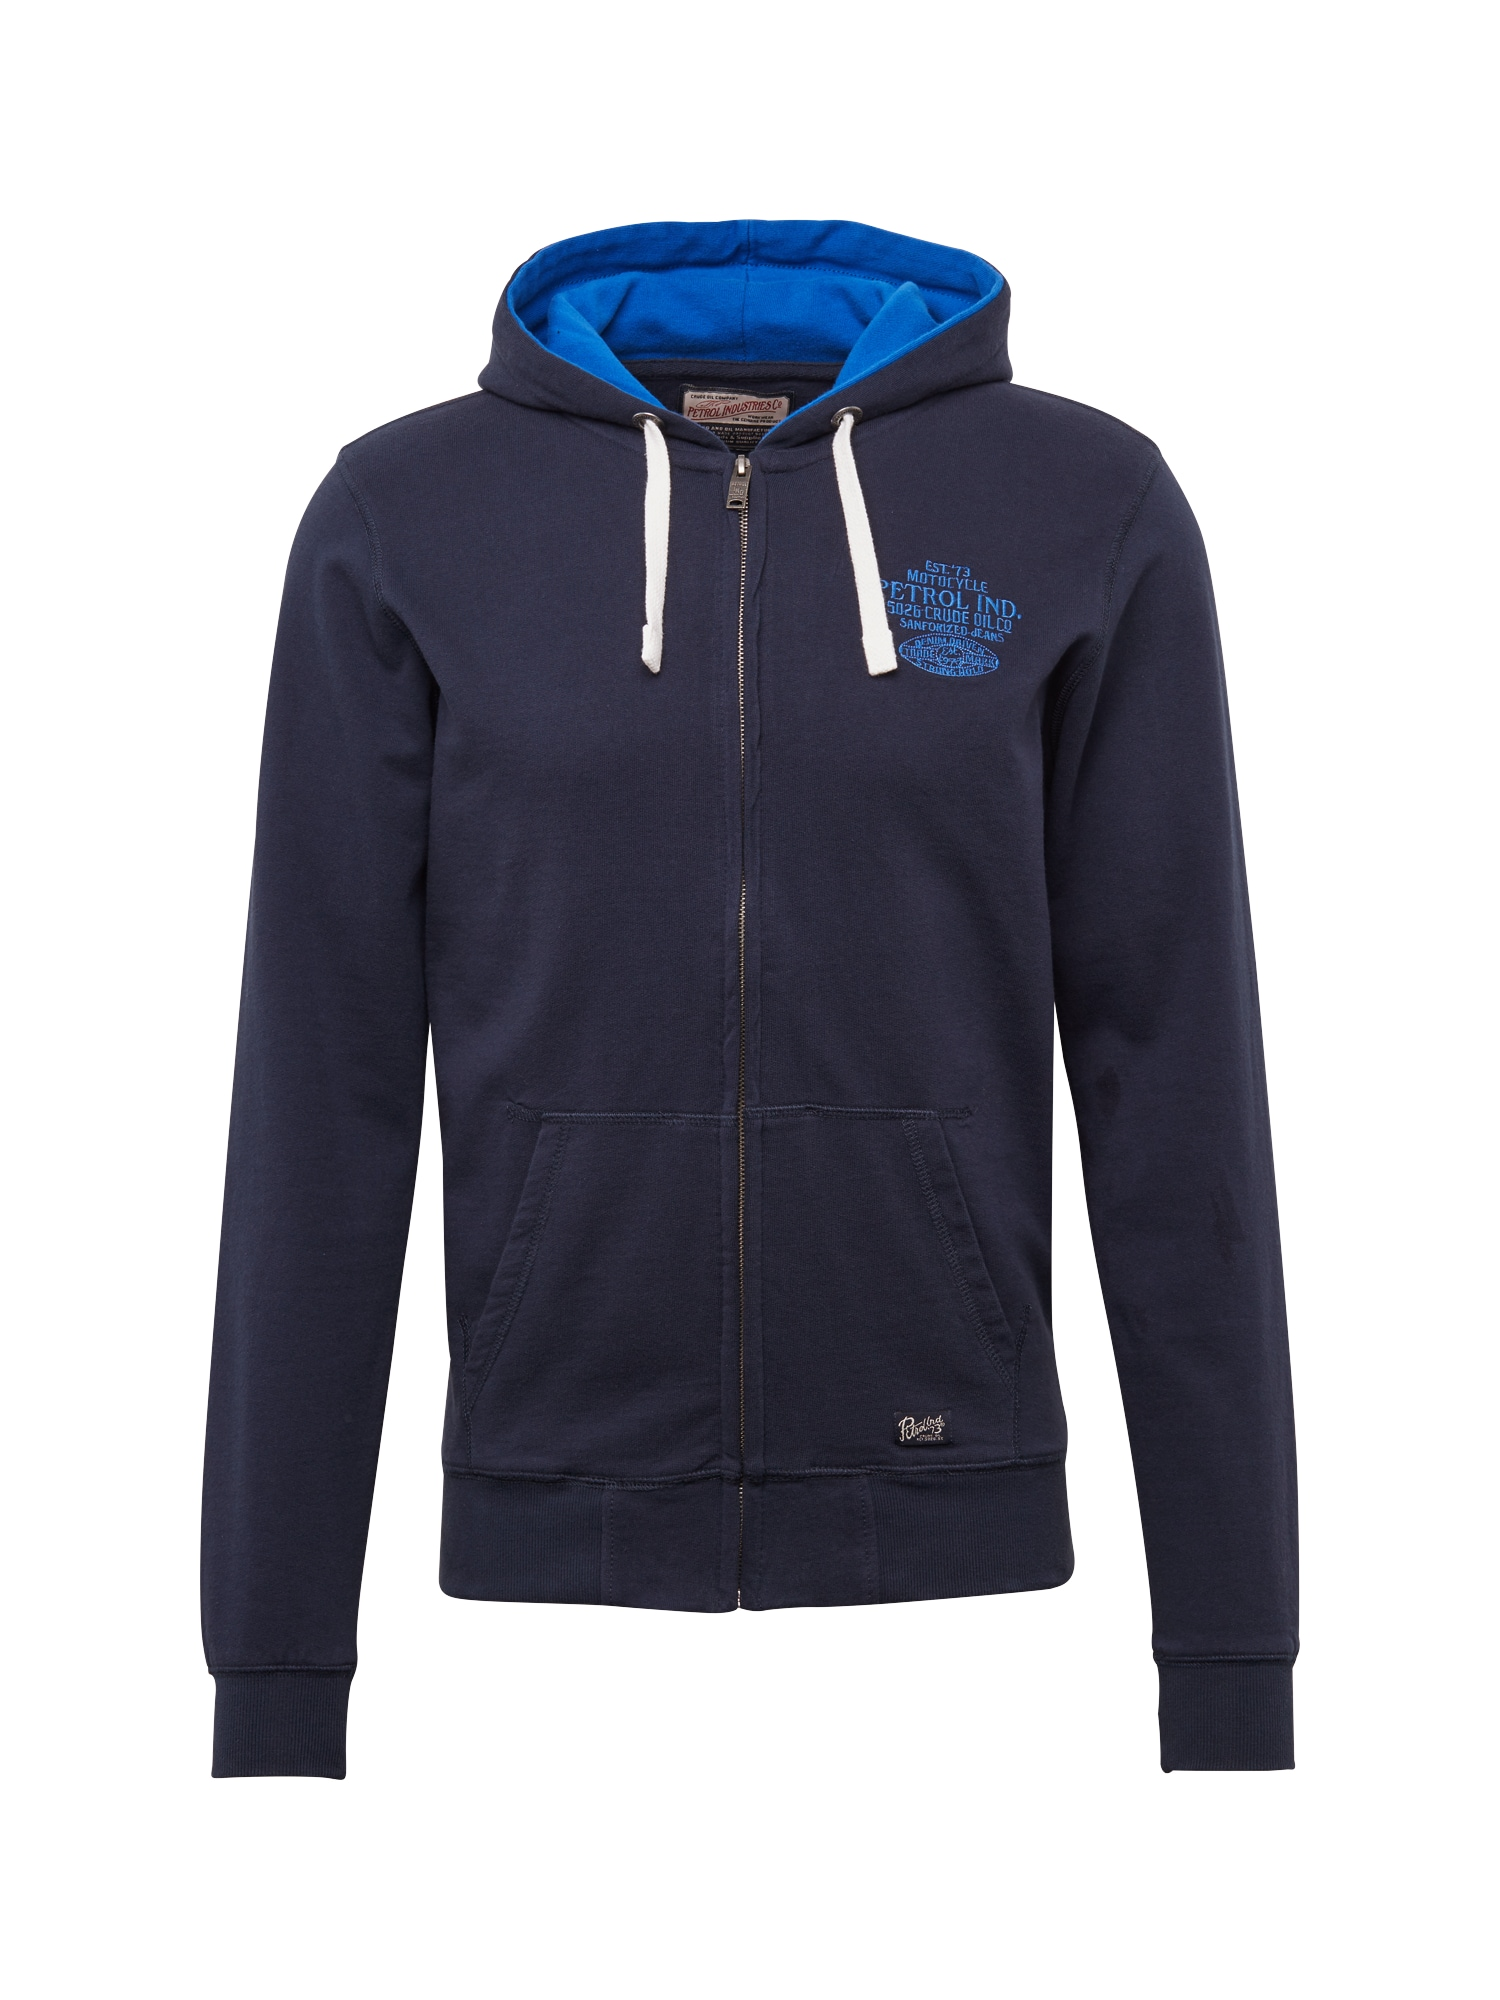 Mikina s kapucí tmavě modrá Petrol Industries